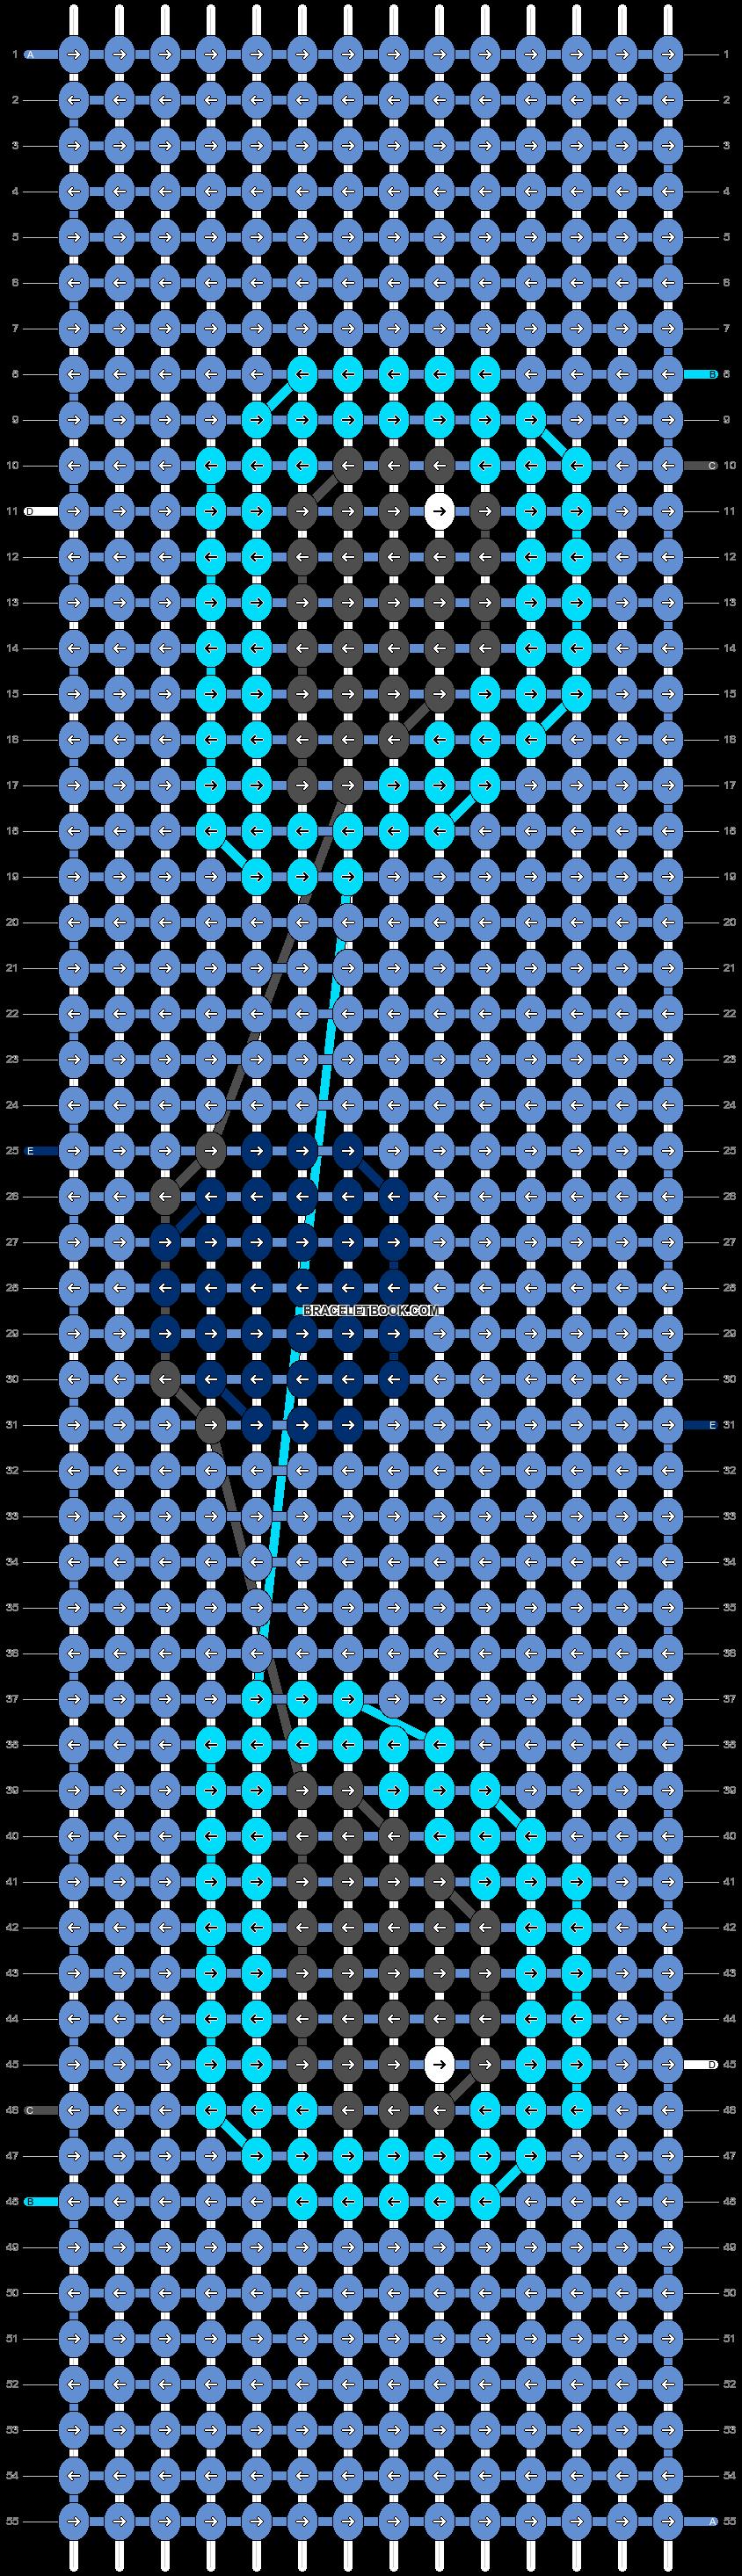 Alpha pattern #18850 pattern